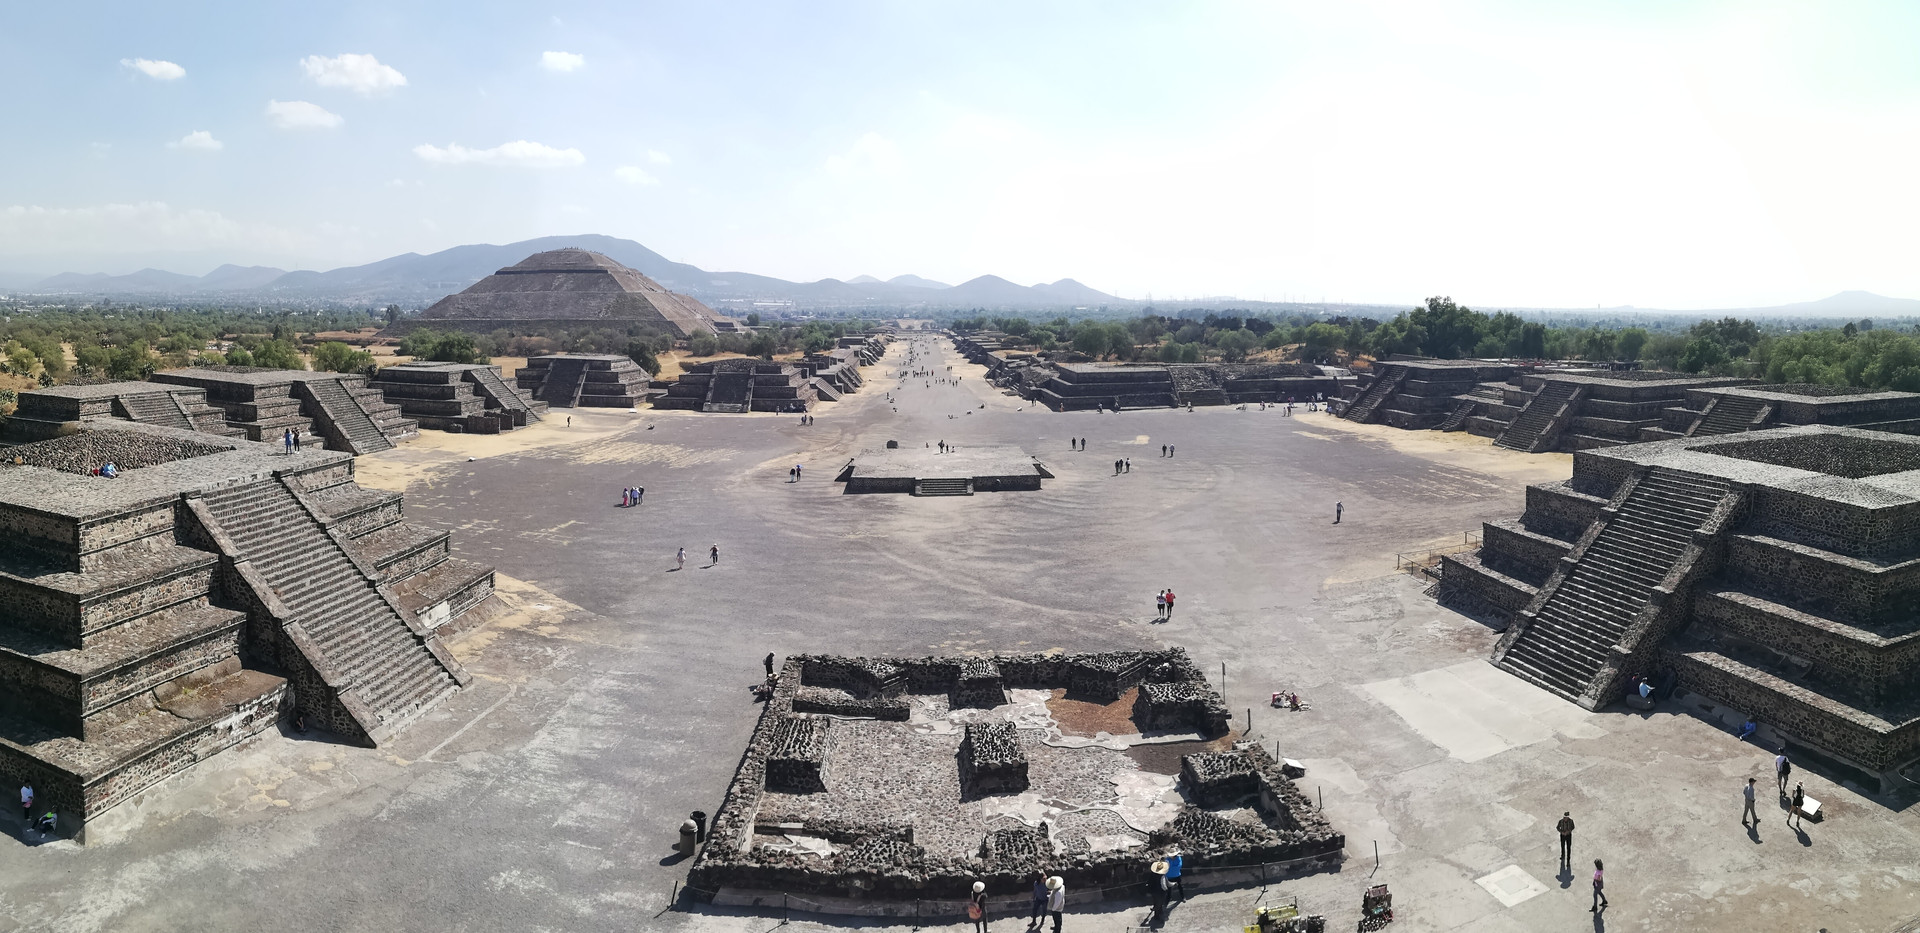 Vue d'ensemble Teotihuacan.jpg